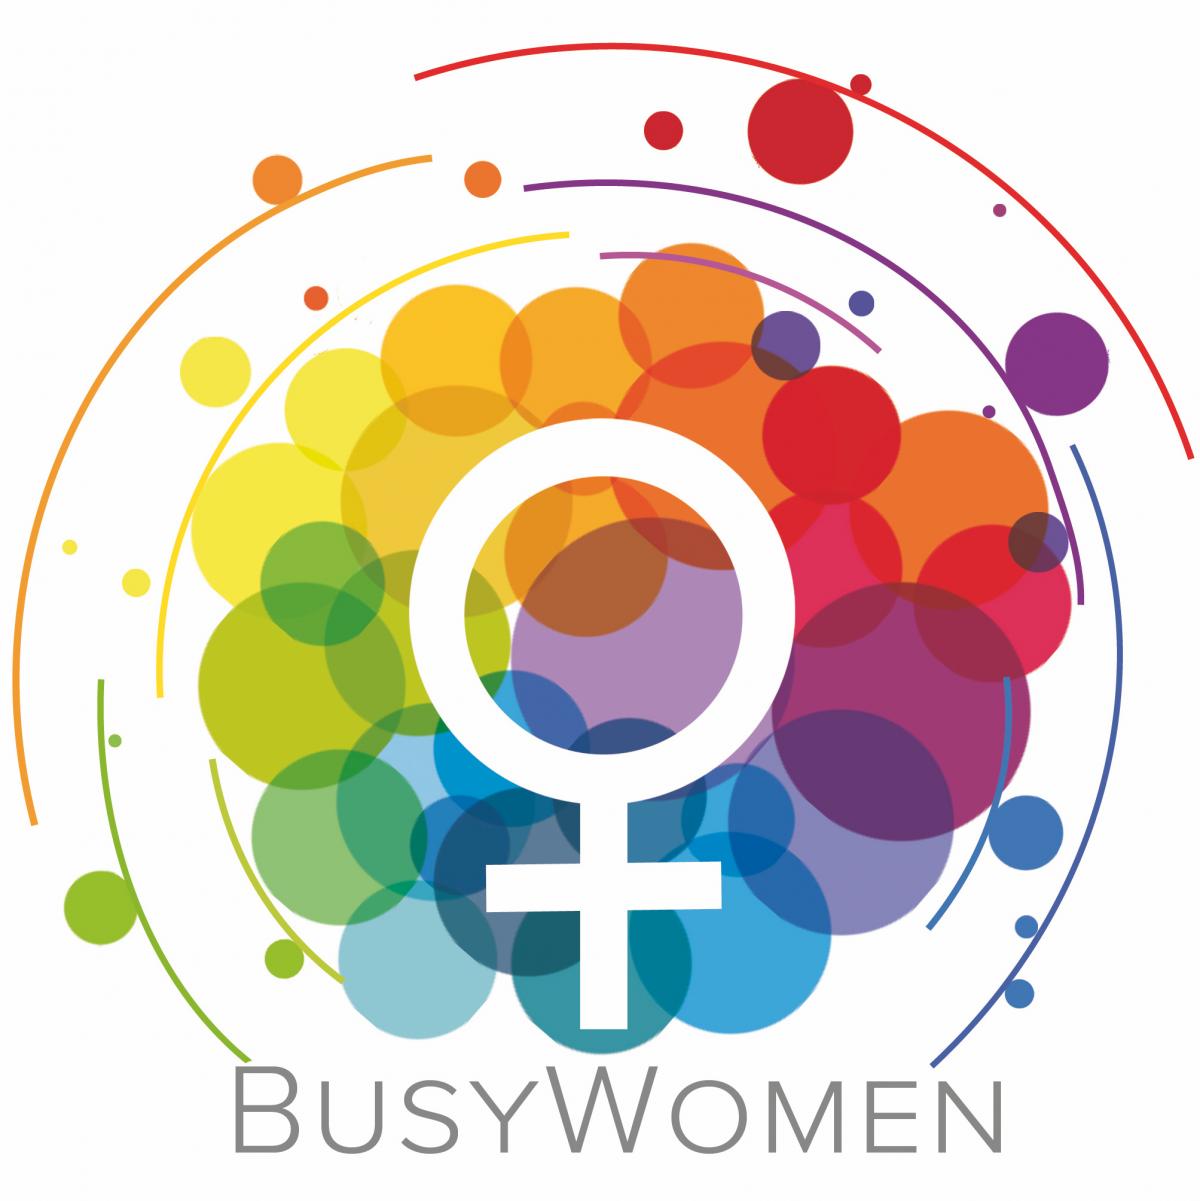 BUSYWOMEN, LE RESEAU FEMININ DE MYBUSYMEAL New Release